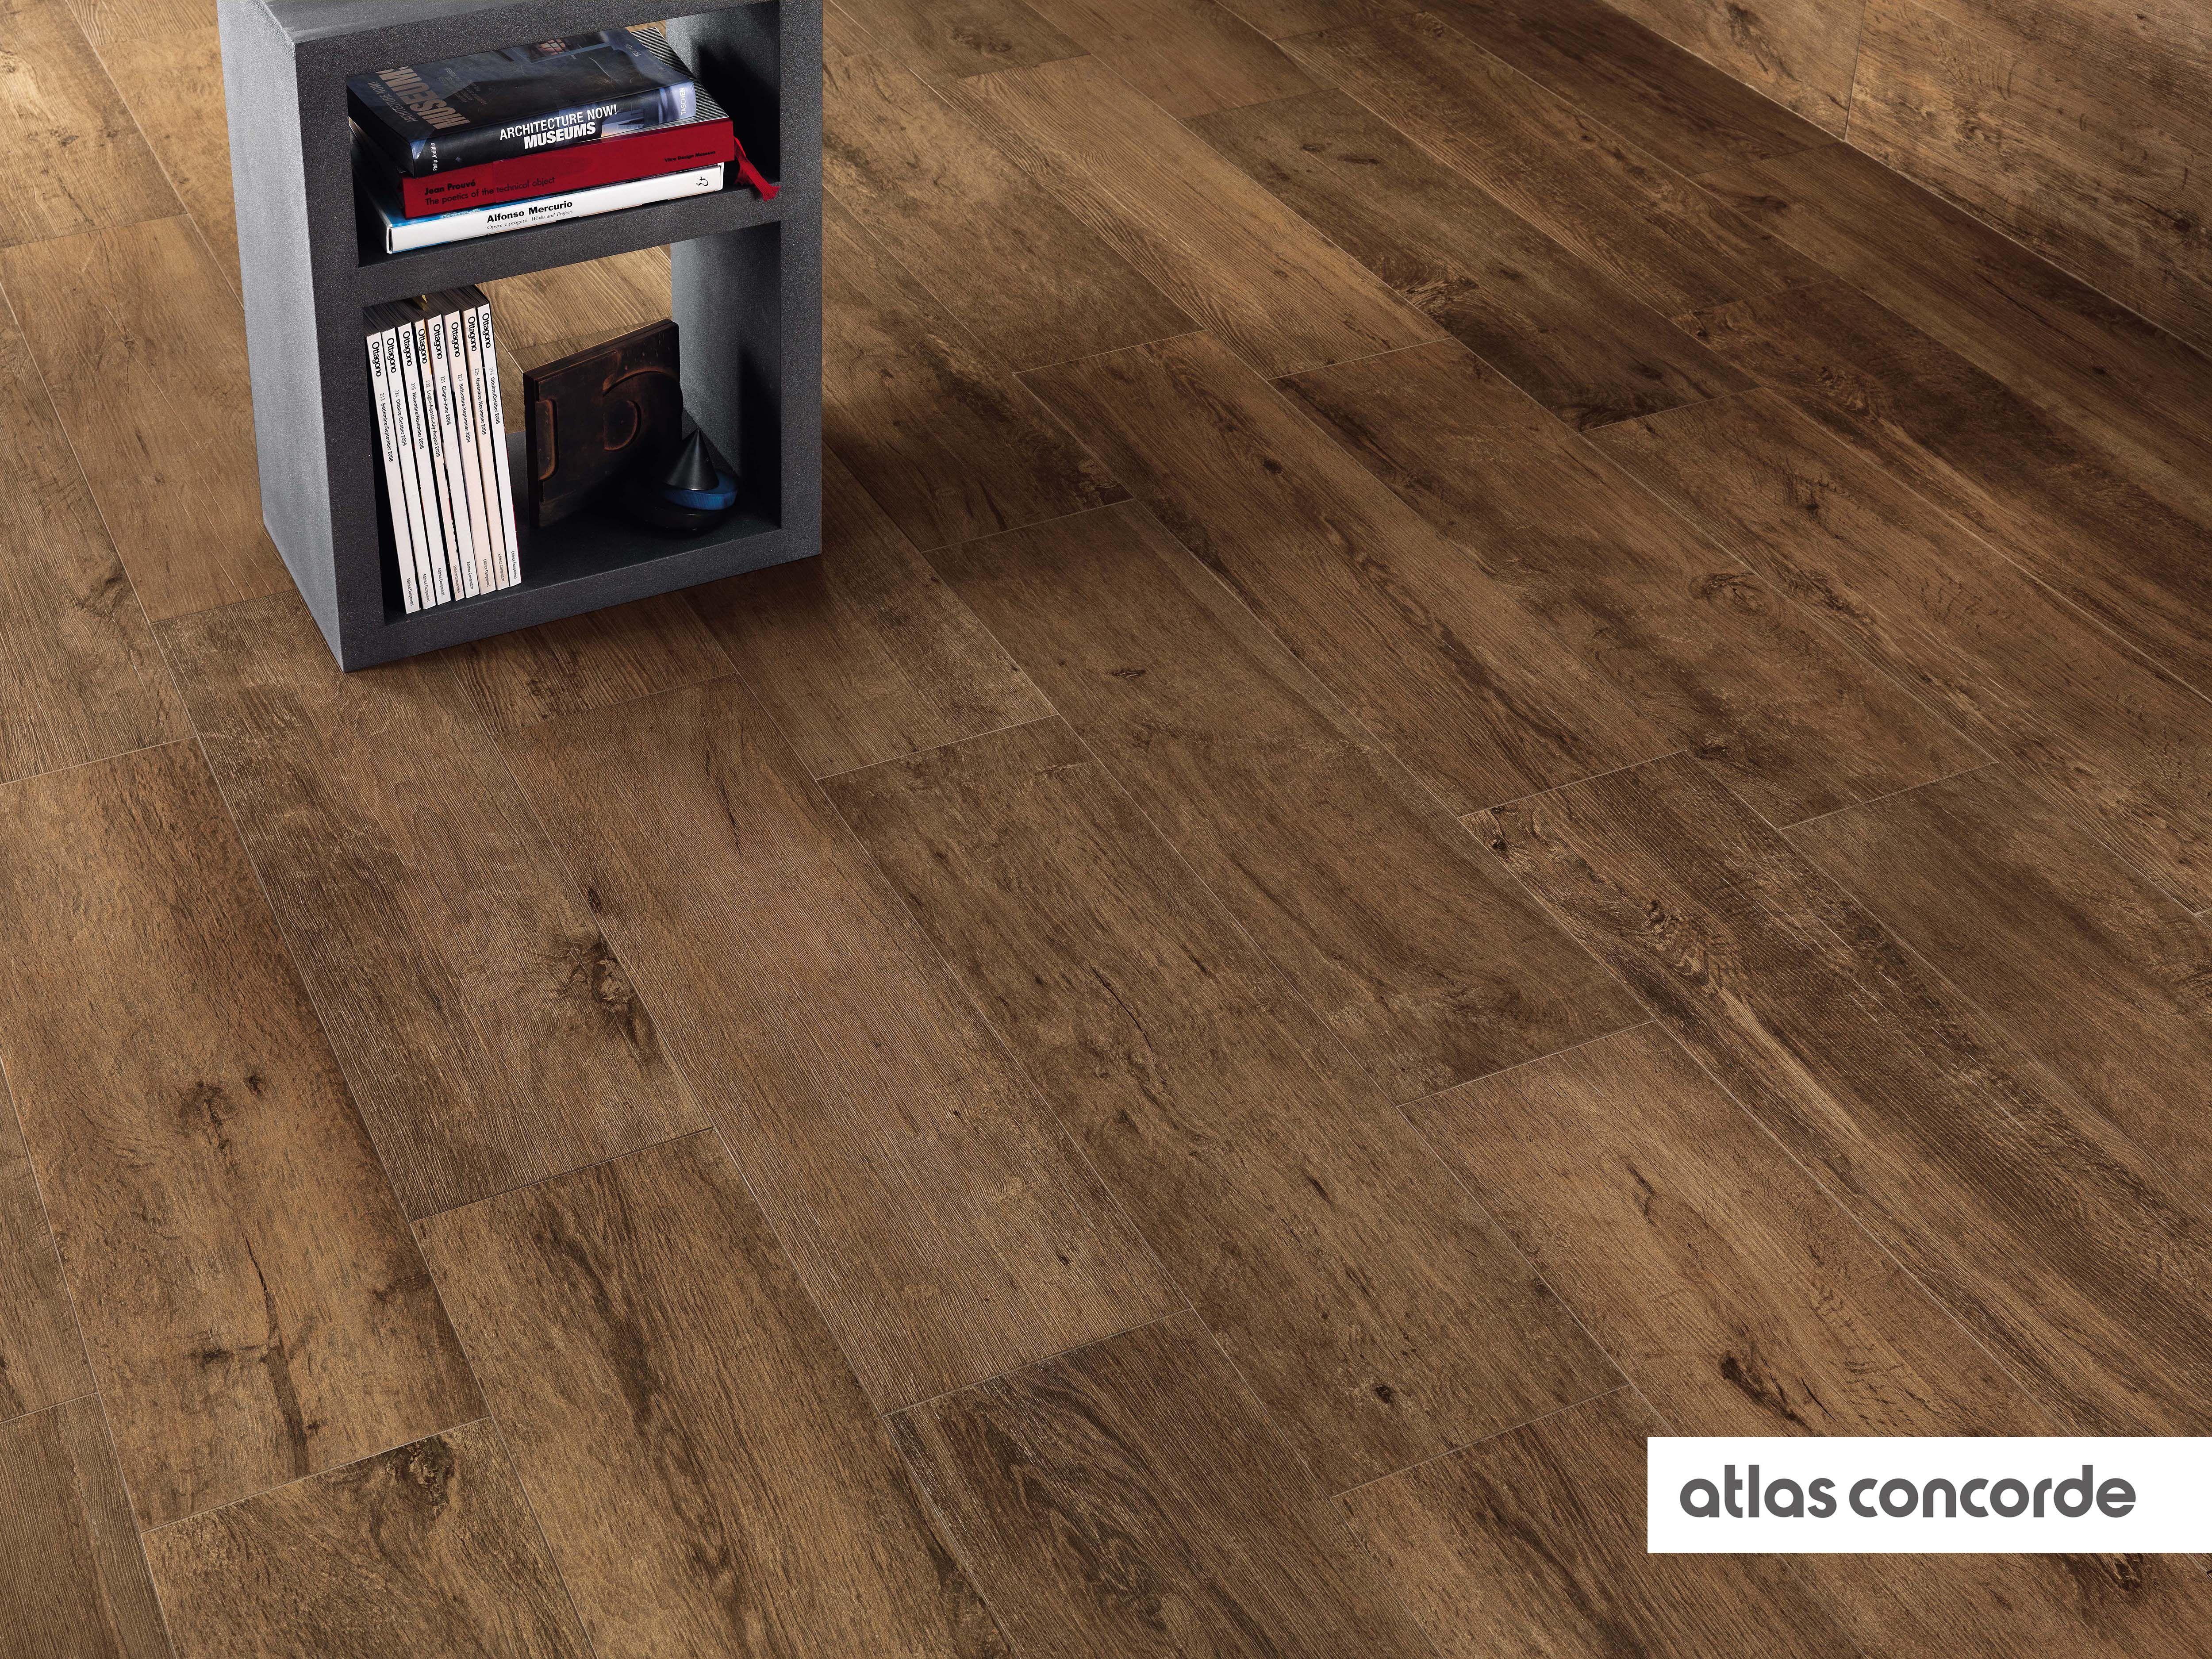 Collections concorde axi atlas concorde wood look porcelain tiles golden oak matt dailygadgetfo Choice Image